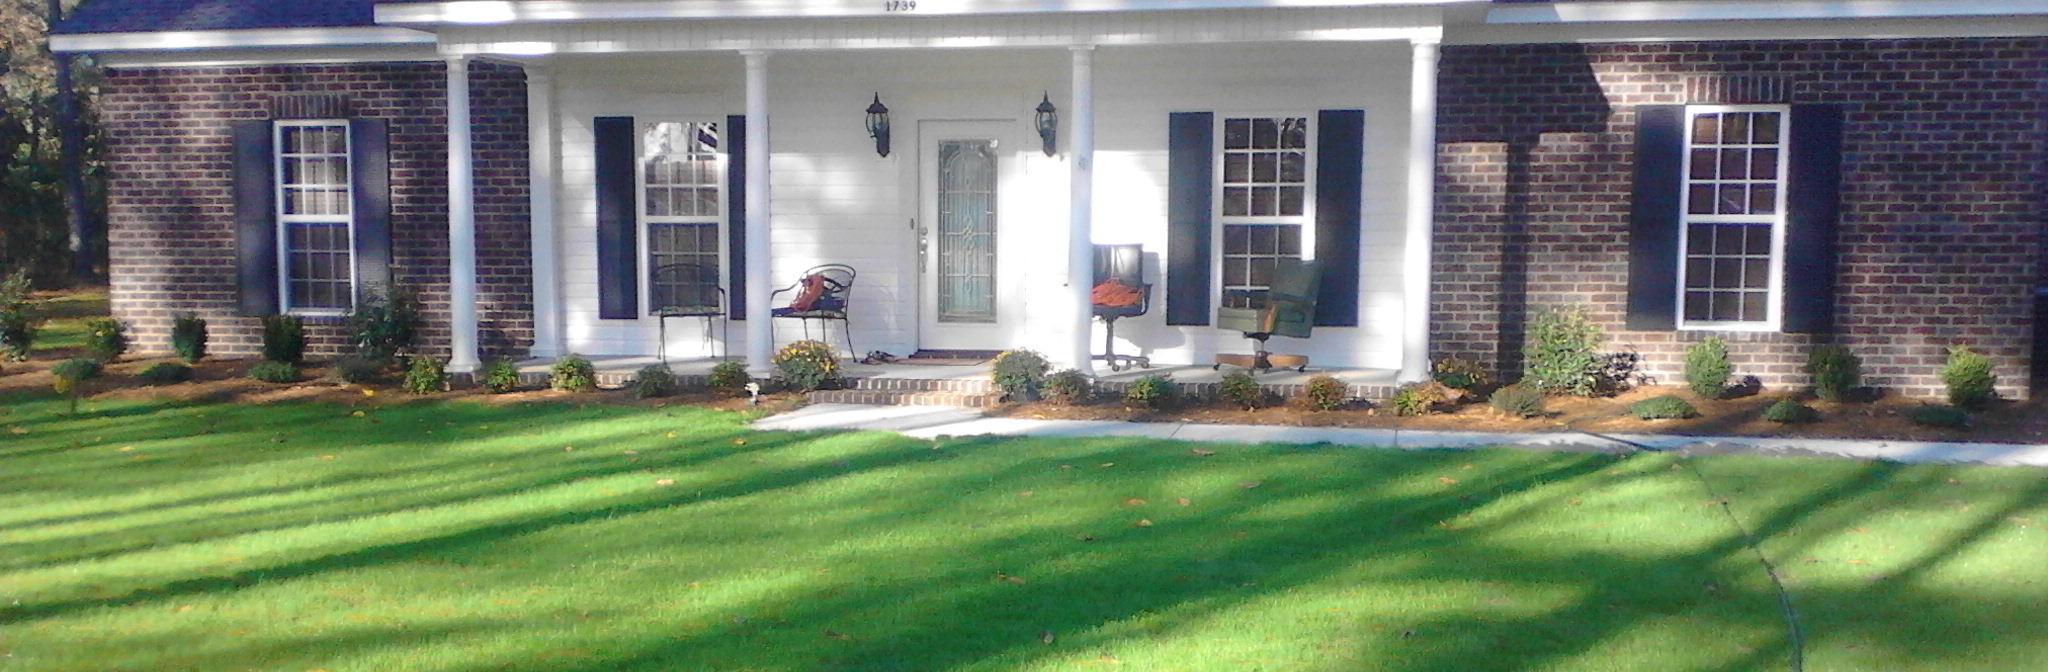 Landscape Contractor Augusta GA | Bill Harley Company